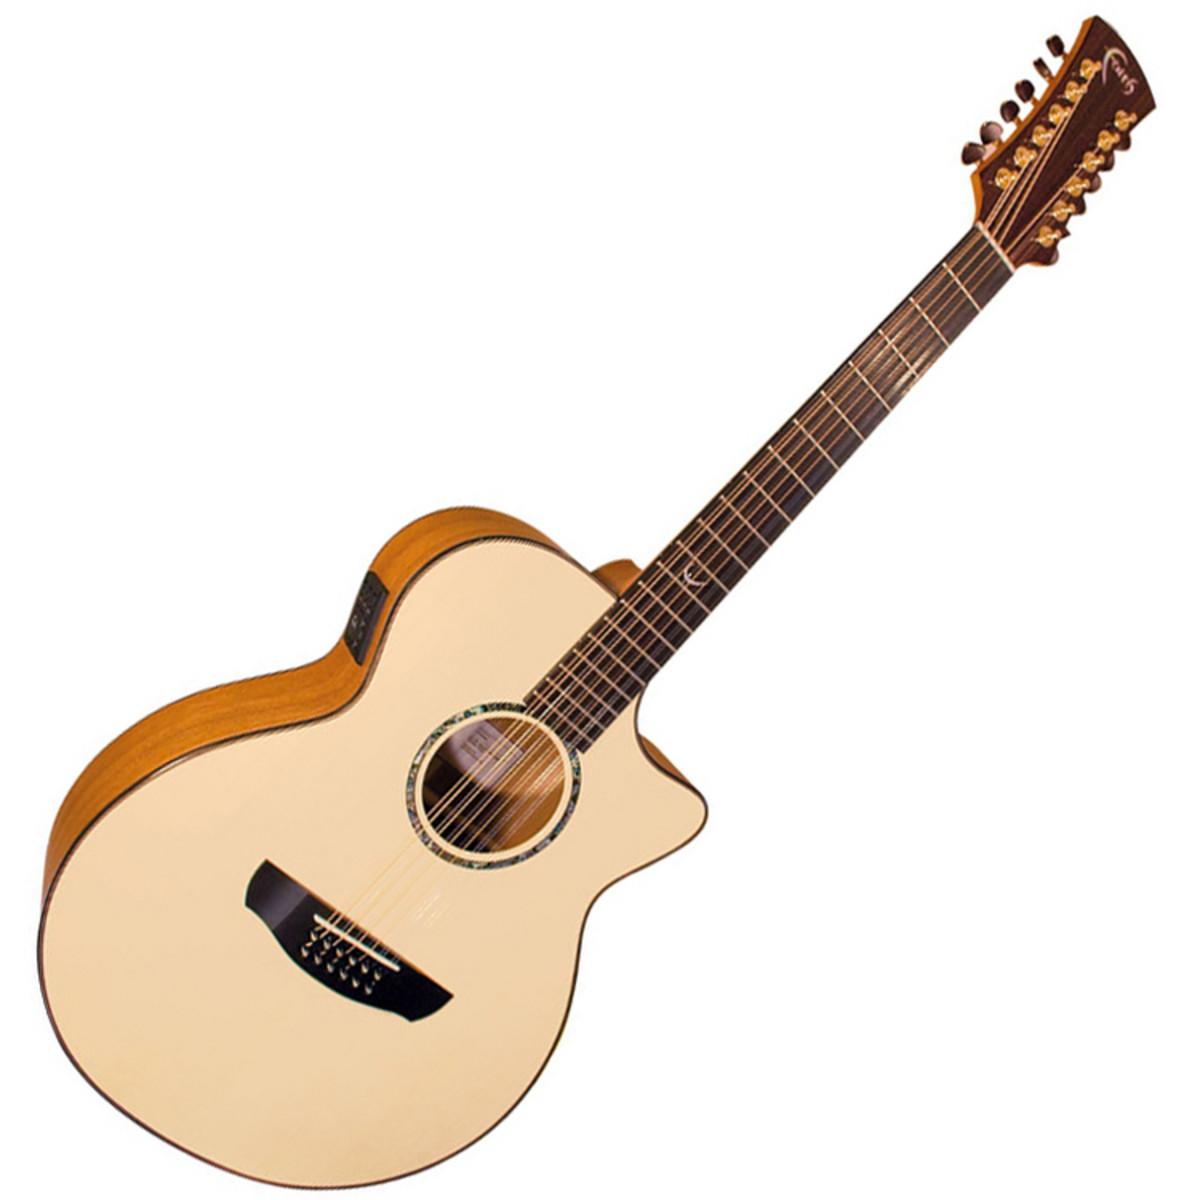 Faith Trembesi 12 String Cutaway Electro Acoustic Guitar, Natural.